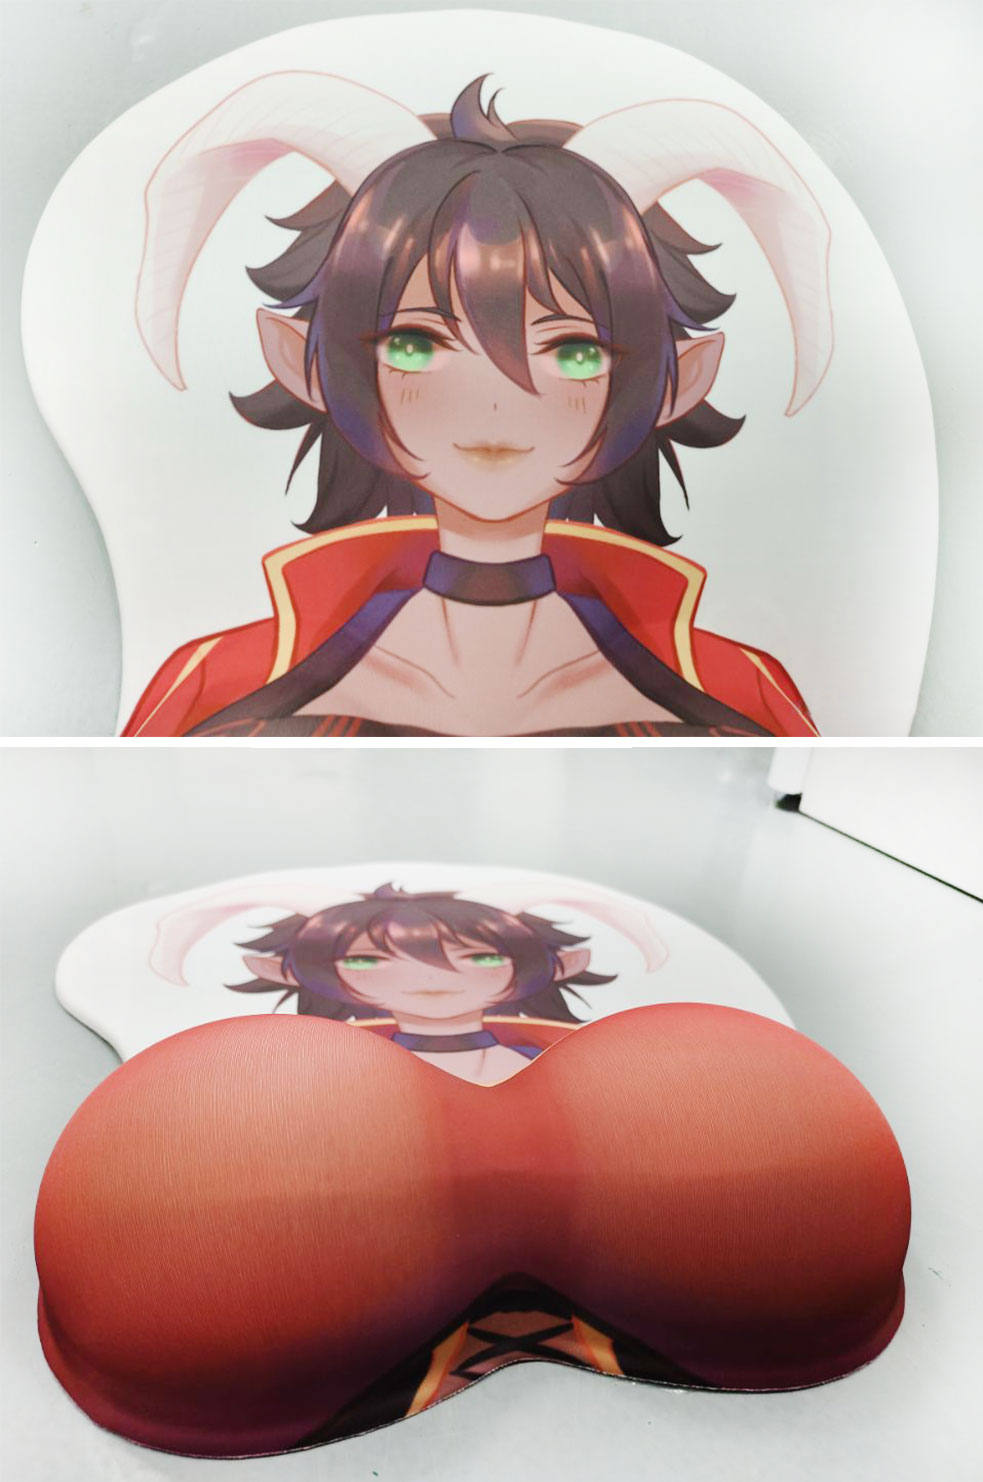 neliel life size oppai mousepad 3443 - Anime Mousepads